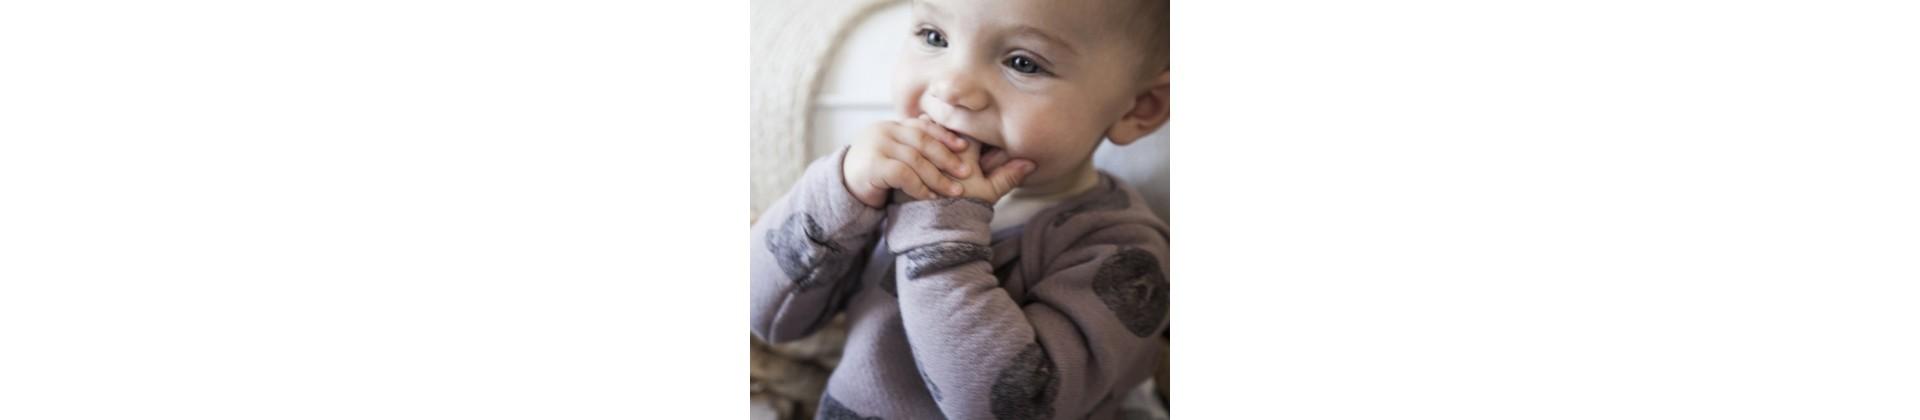 cadeau original bébé garçon | meilleures idées cadeaux garçons (1-2 ans)